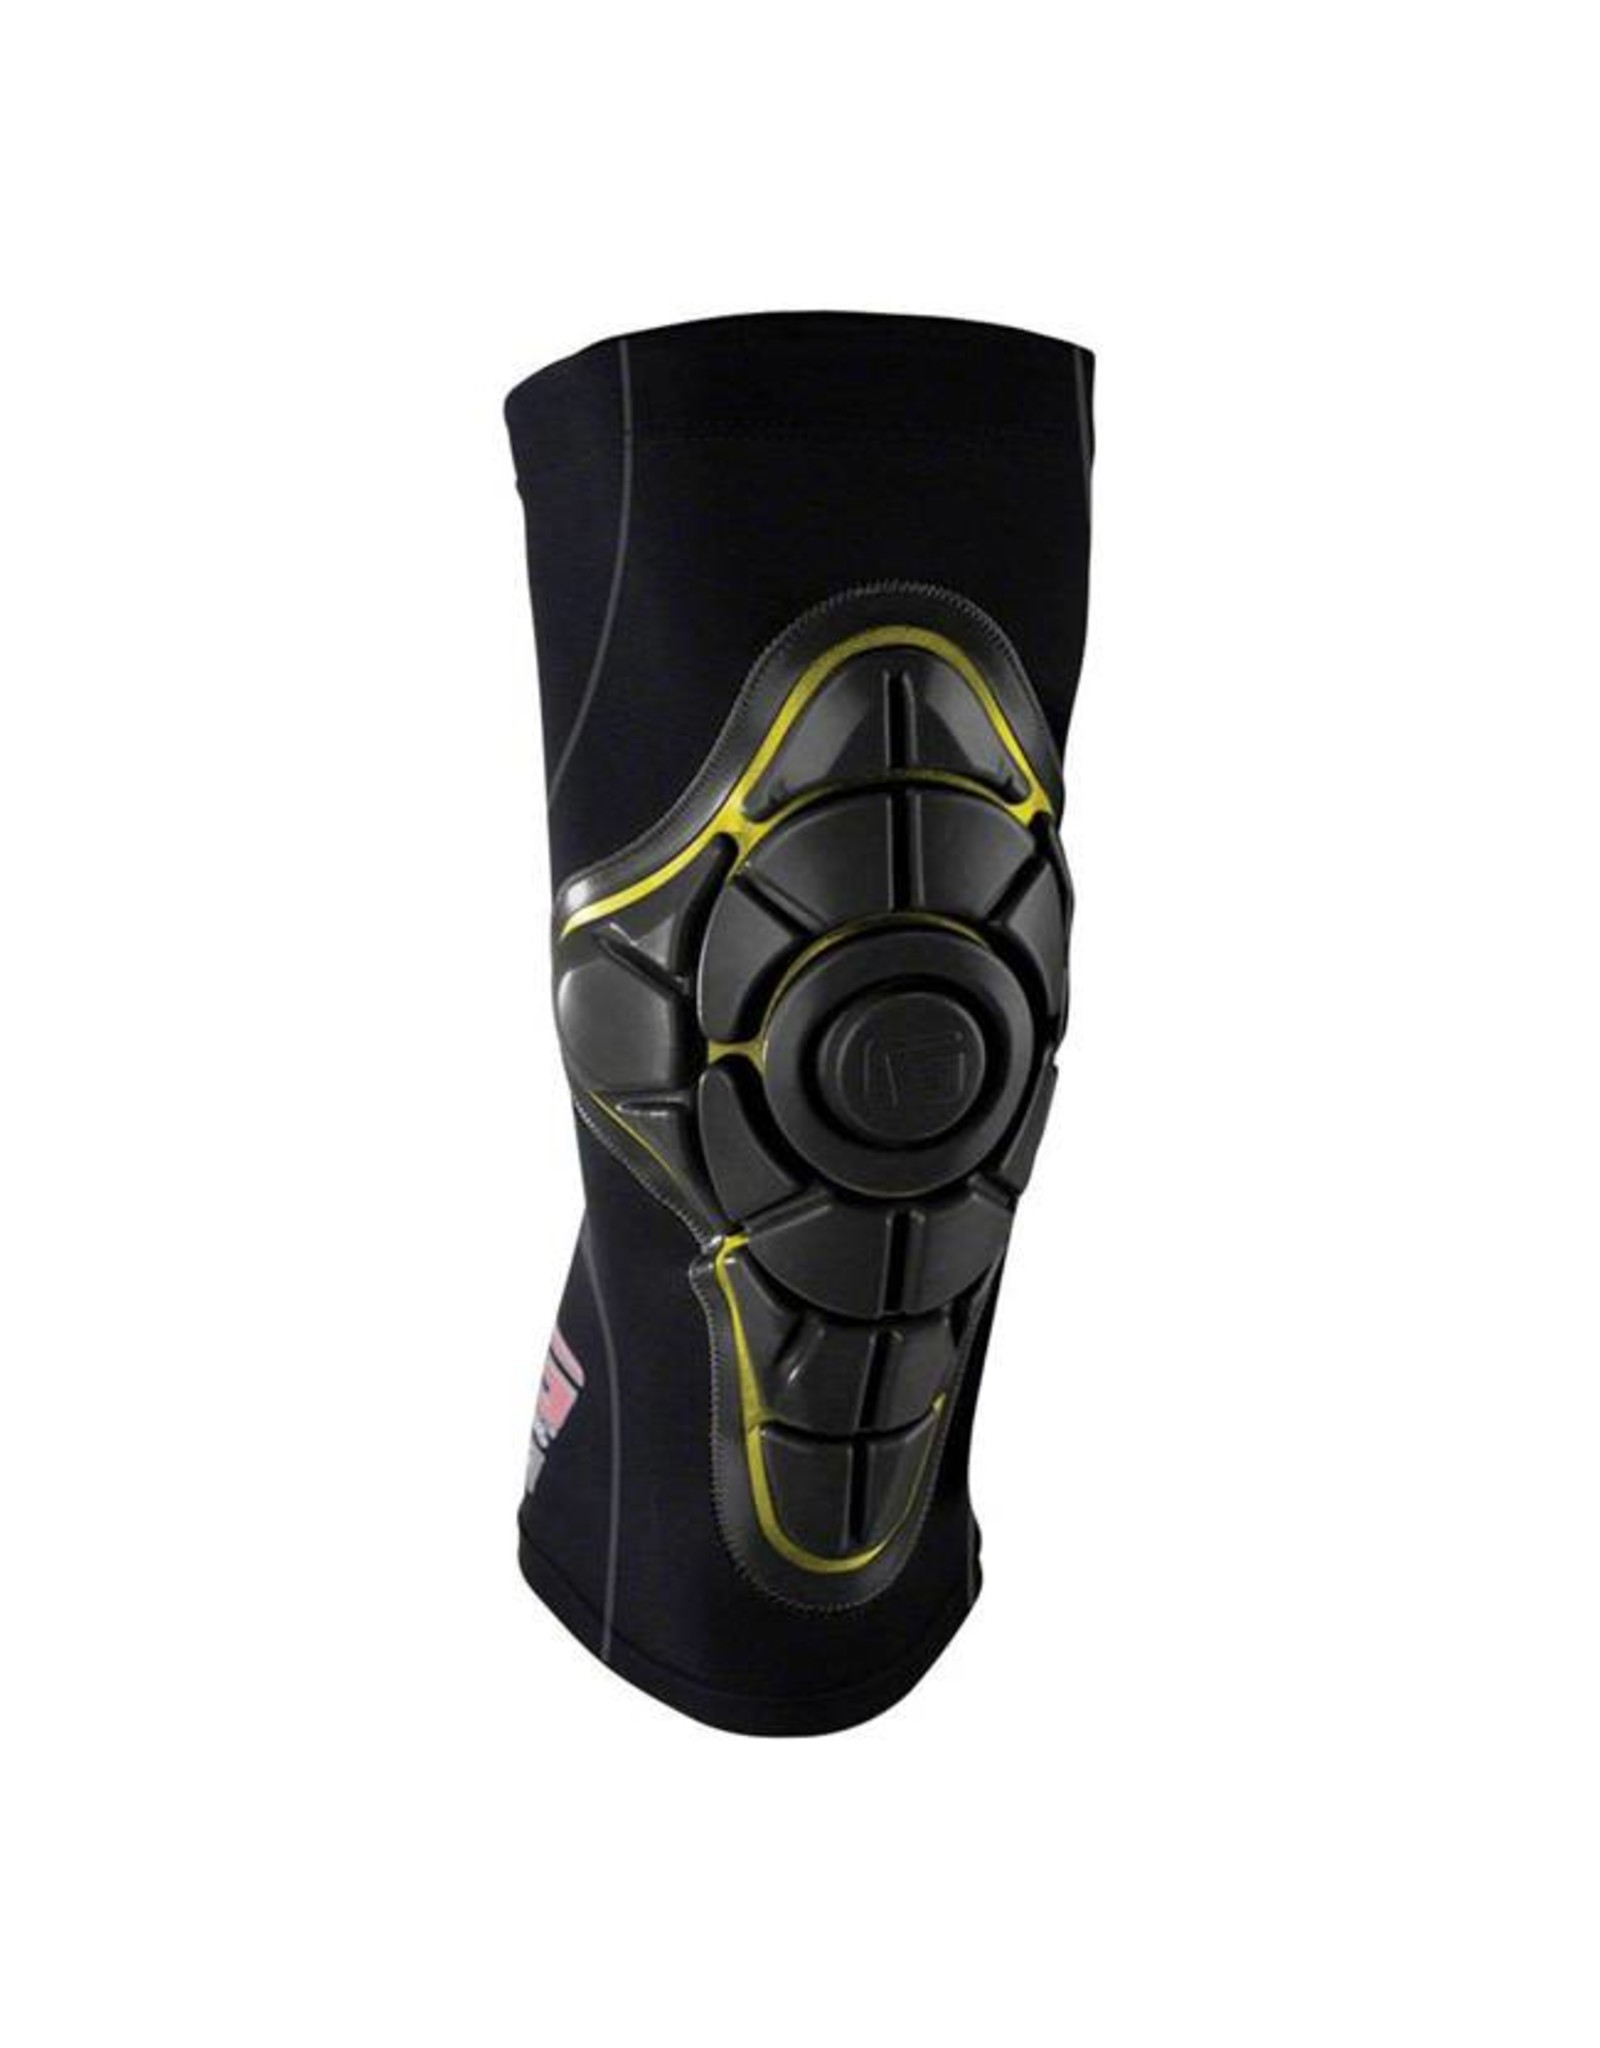 G-Form G-Form Pro-X Knee Pad: Black/Yellow MD